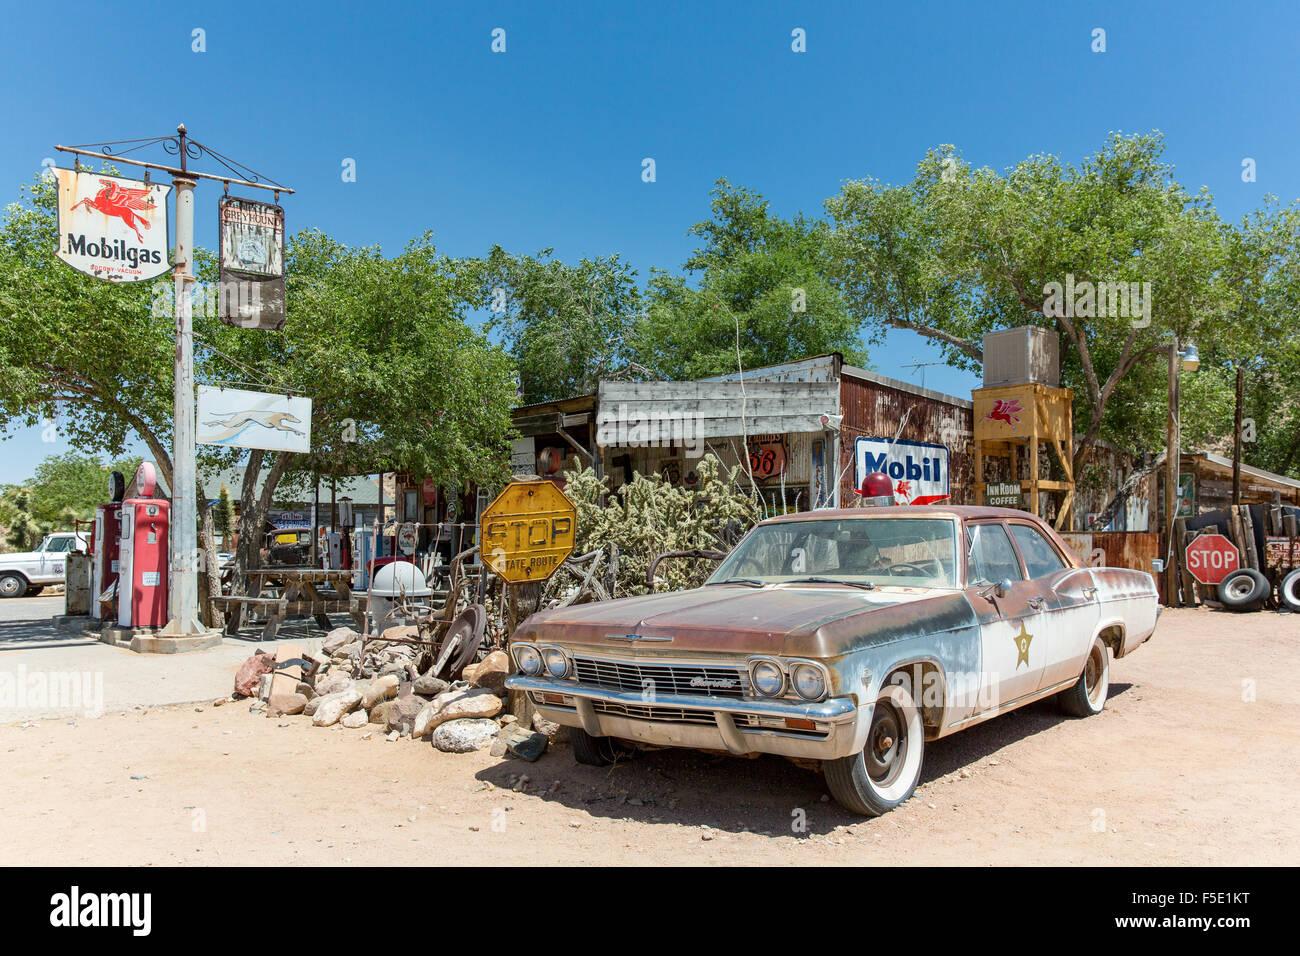 Ein altes Sheriffs Auto (Policecar) Hackberrys Gemischtwarenladen in Kingman, Arizona, USA Stockbild